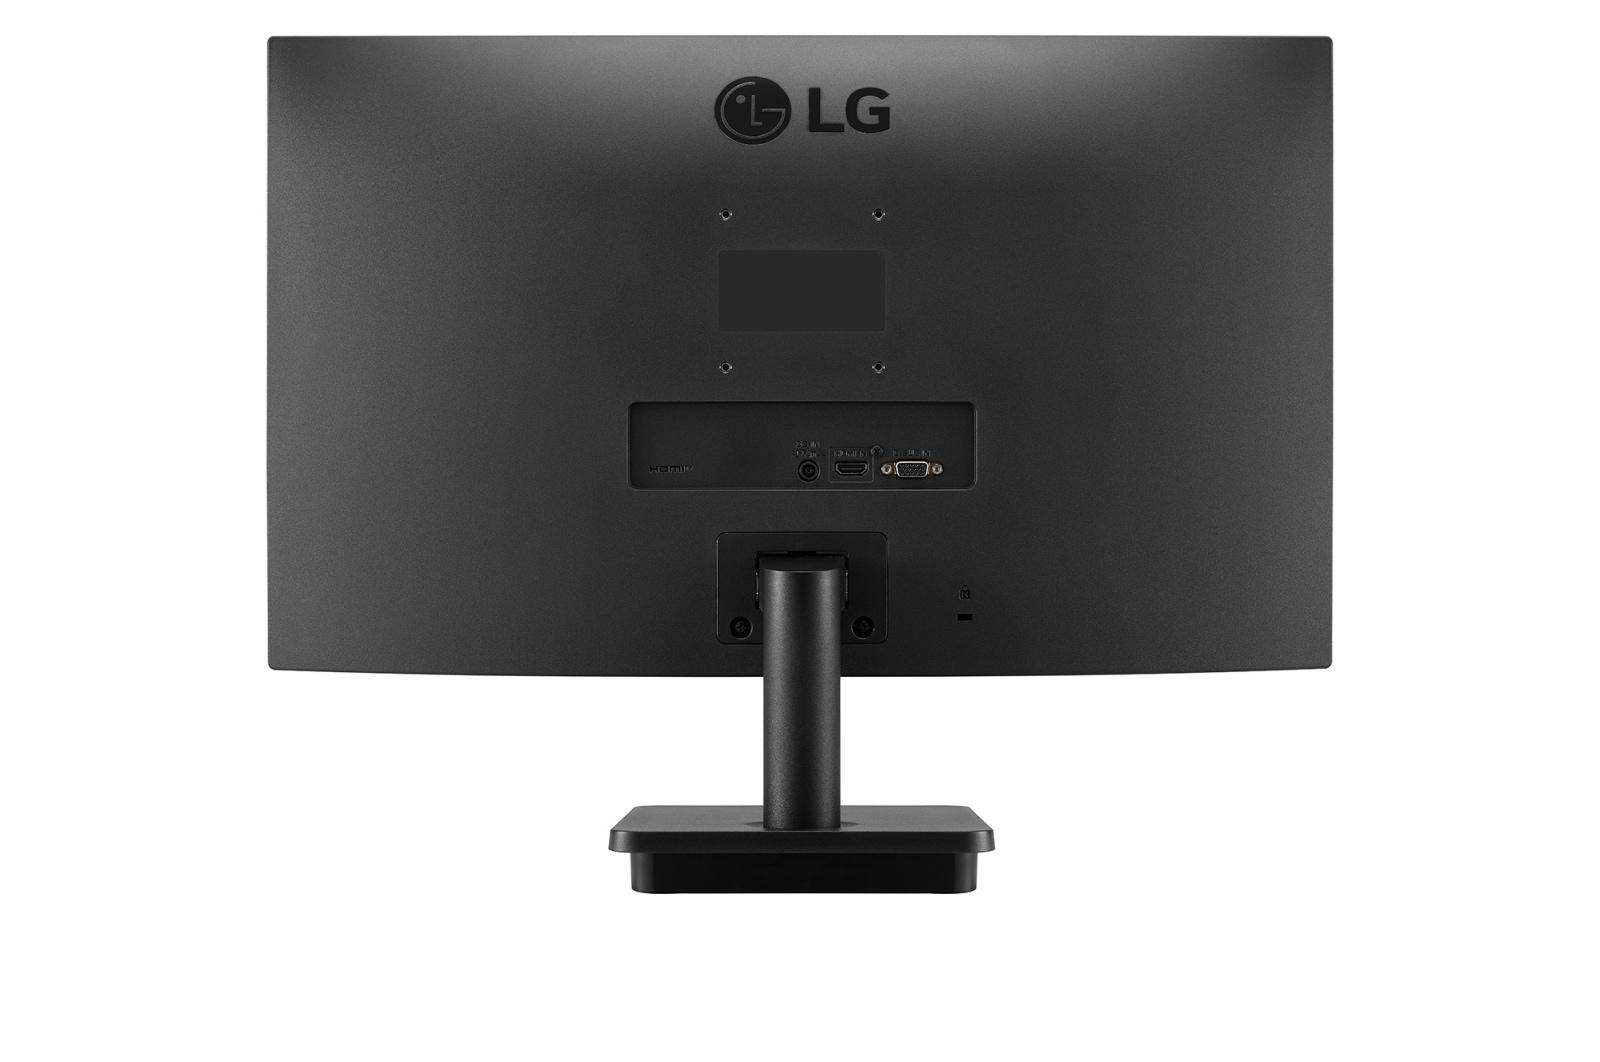 LG 没入感を高める3辺フレームレスデザイン23.8インチフルHDモニター, rear view, 24MP400-B